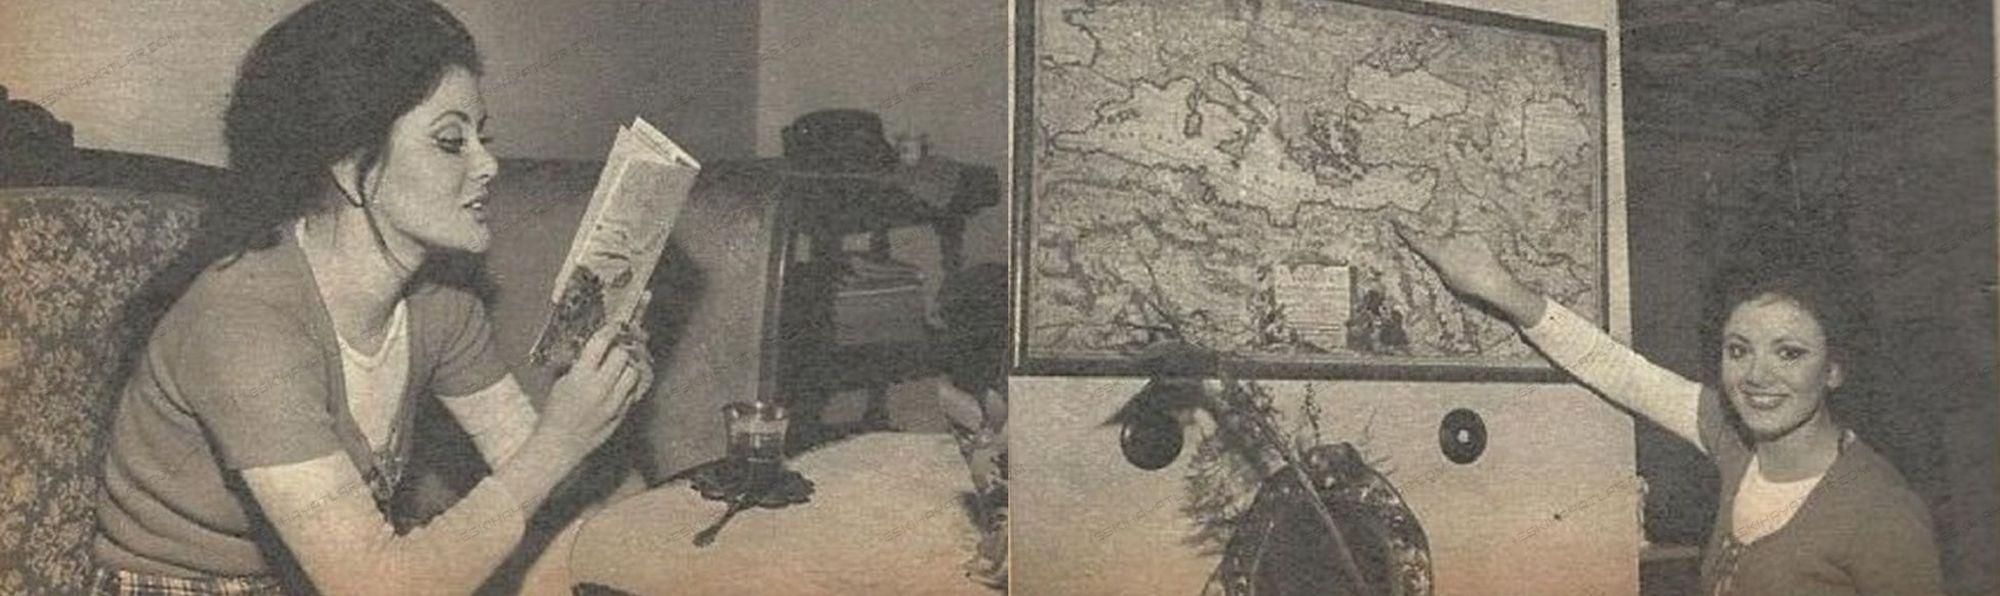 0227-mine-mutlu-fotograflari-1973-ses-dergisi-yetmislerde-turk-sinemasi (0)